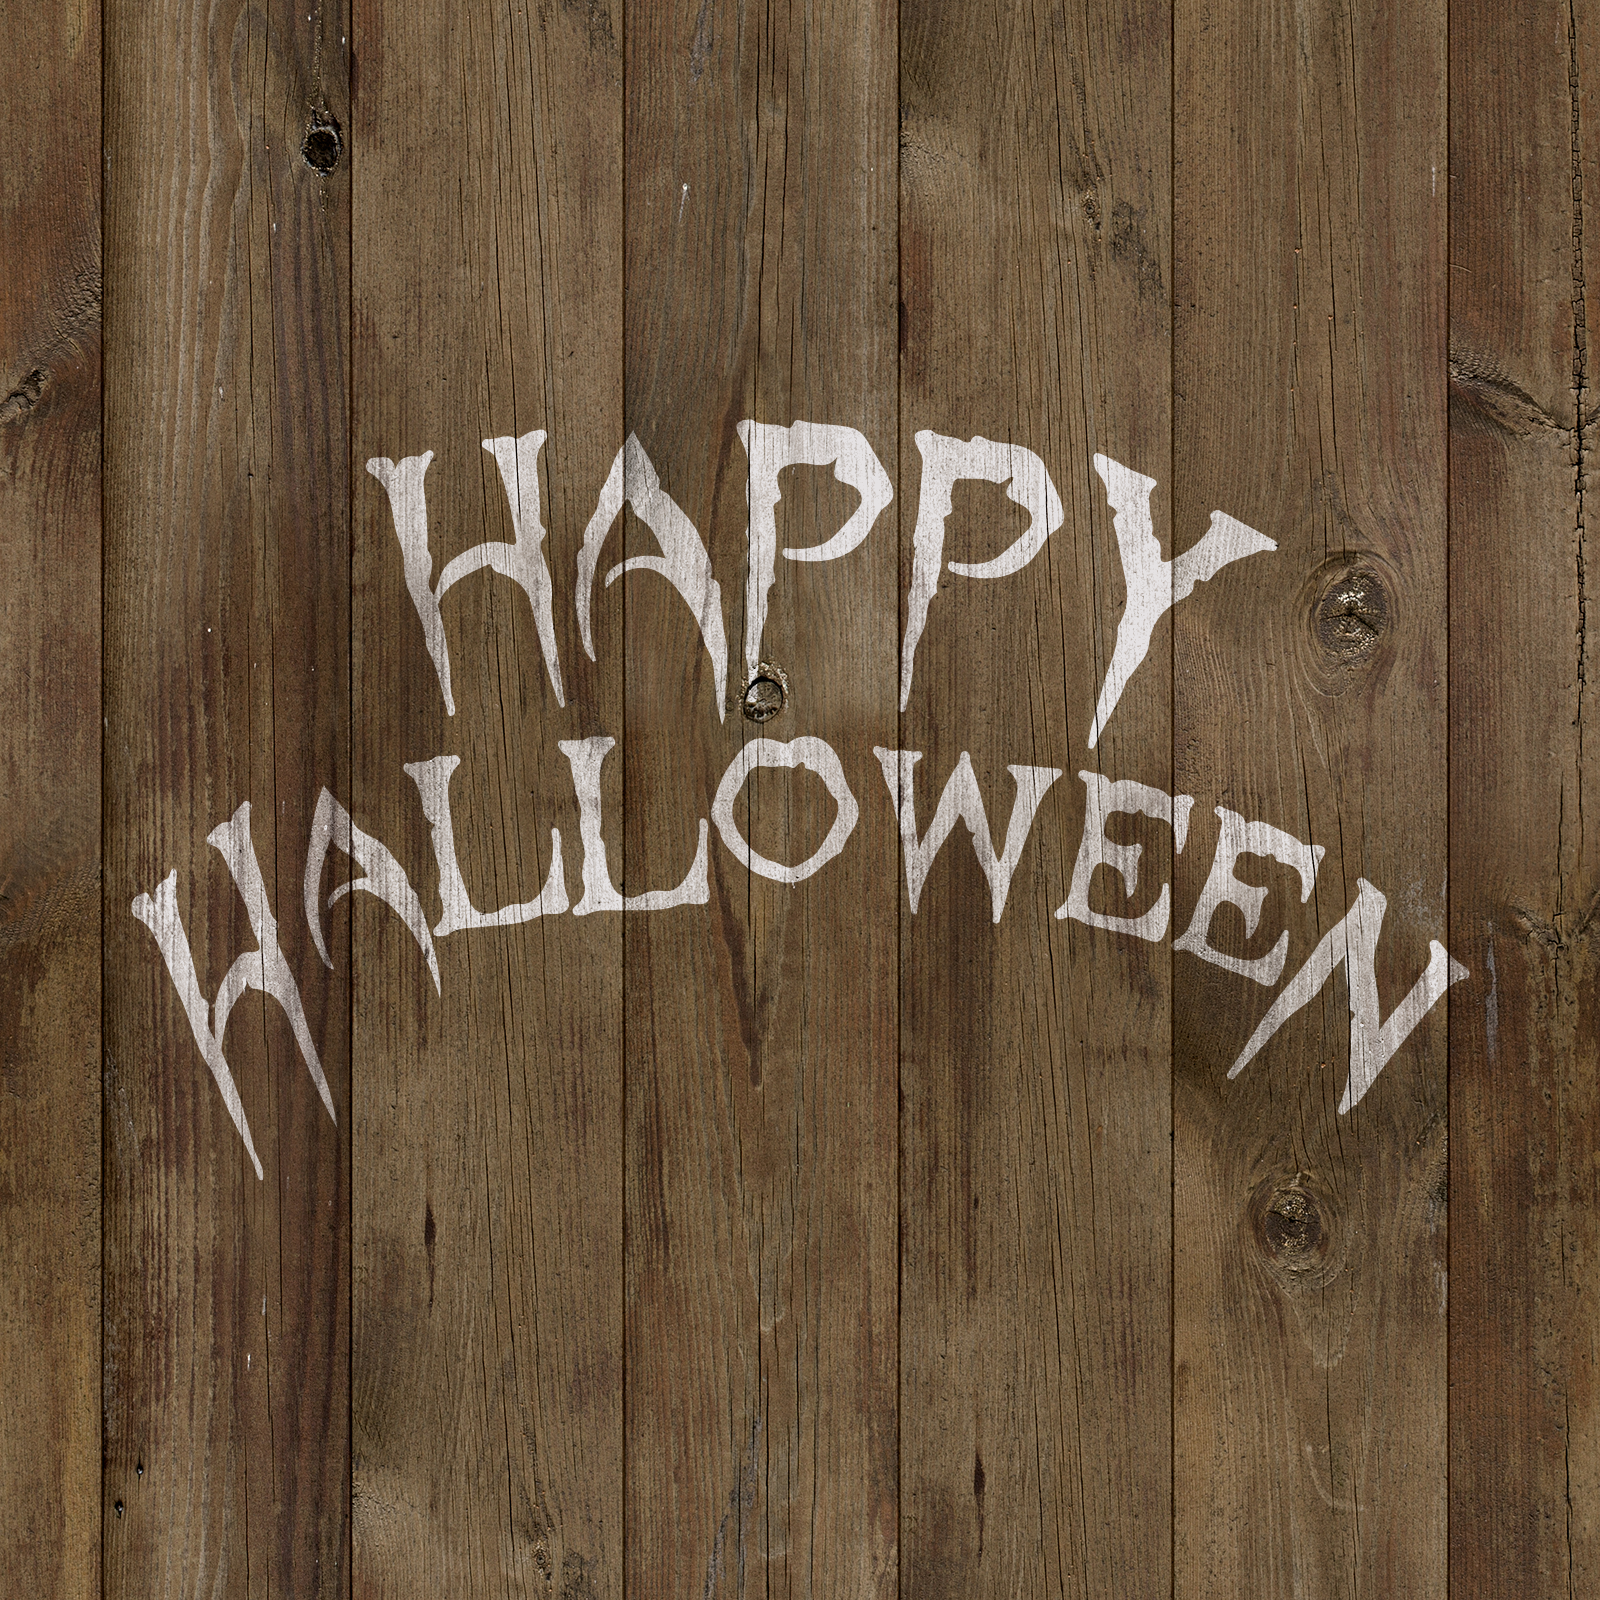 Happy Halloween Wicked Stencil - Reusable Stencils for Halloween